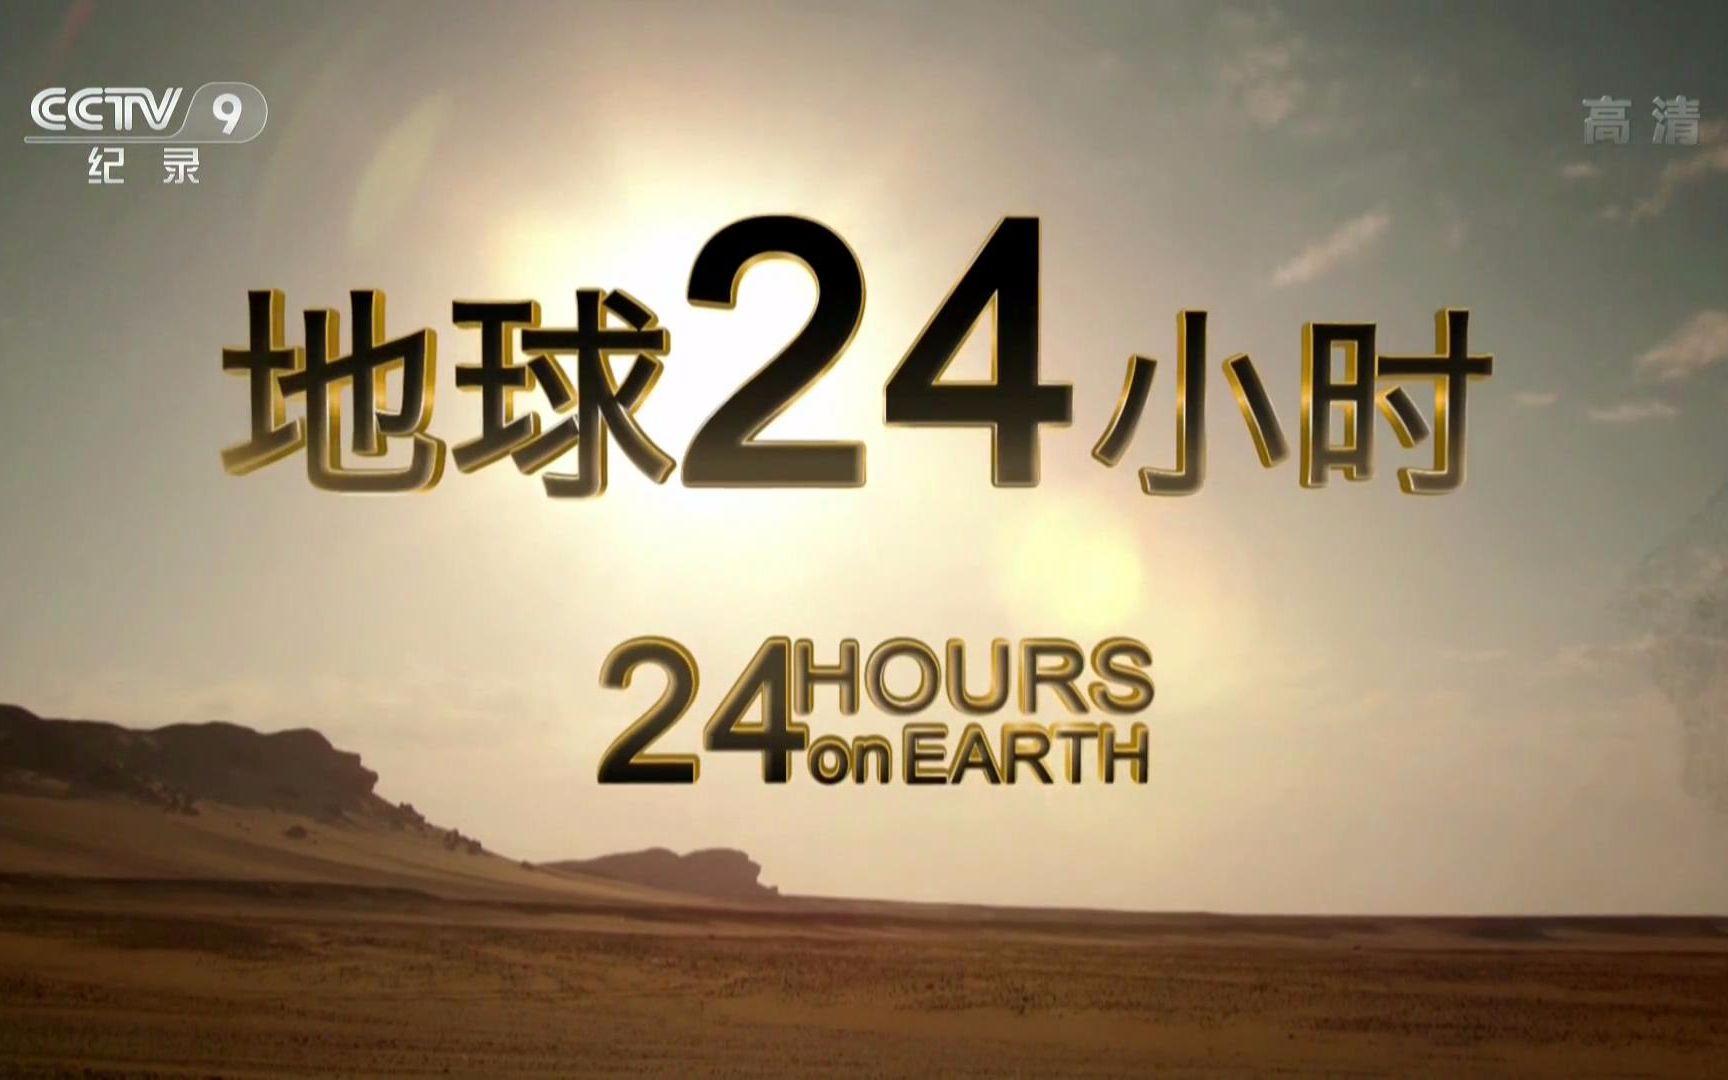 cctv9乔布斯纪录片_1080P【CCTV9-HD】纪录片《地球24小时》_哔哩哔哩 (゜-゜)つロ 干杯 ...